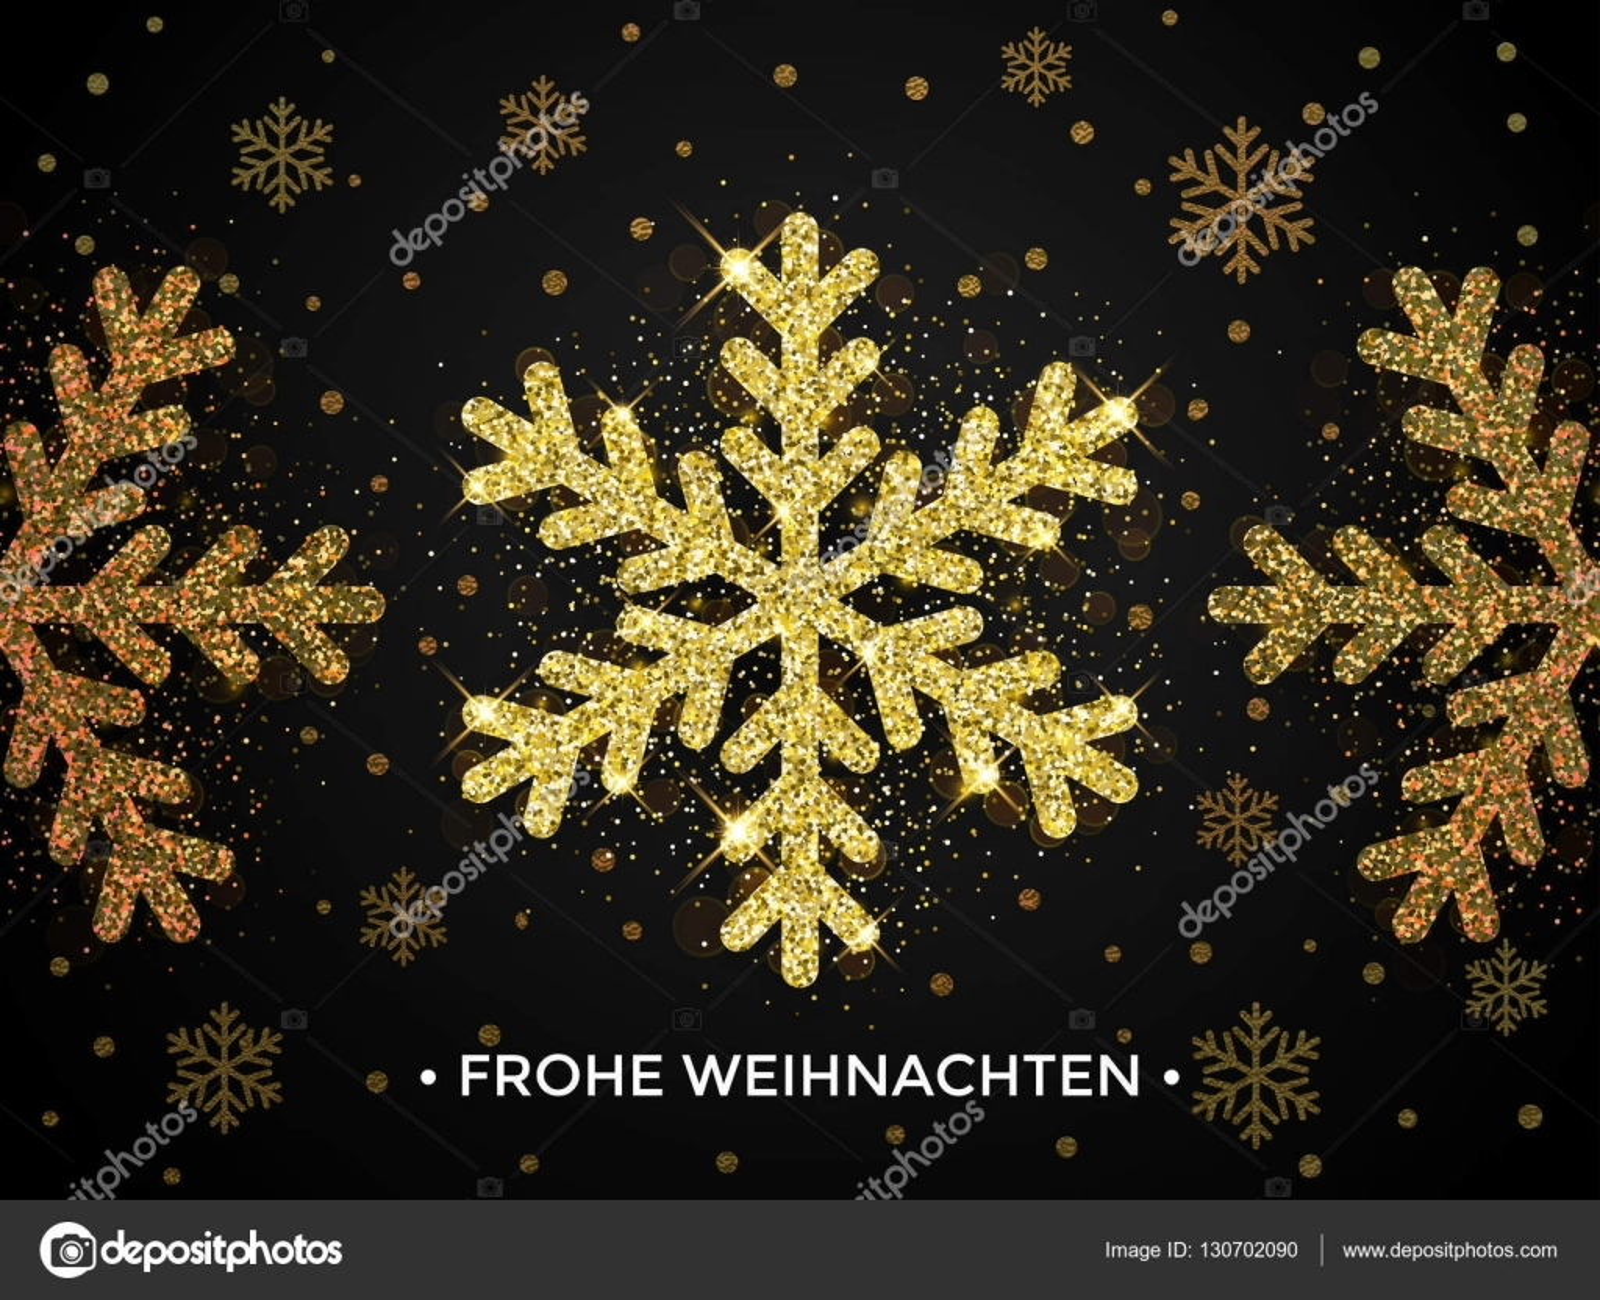 Frohe weihnachten german christmas greeting card stock vector german christmas greeting card stock vector m4hsunfo